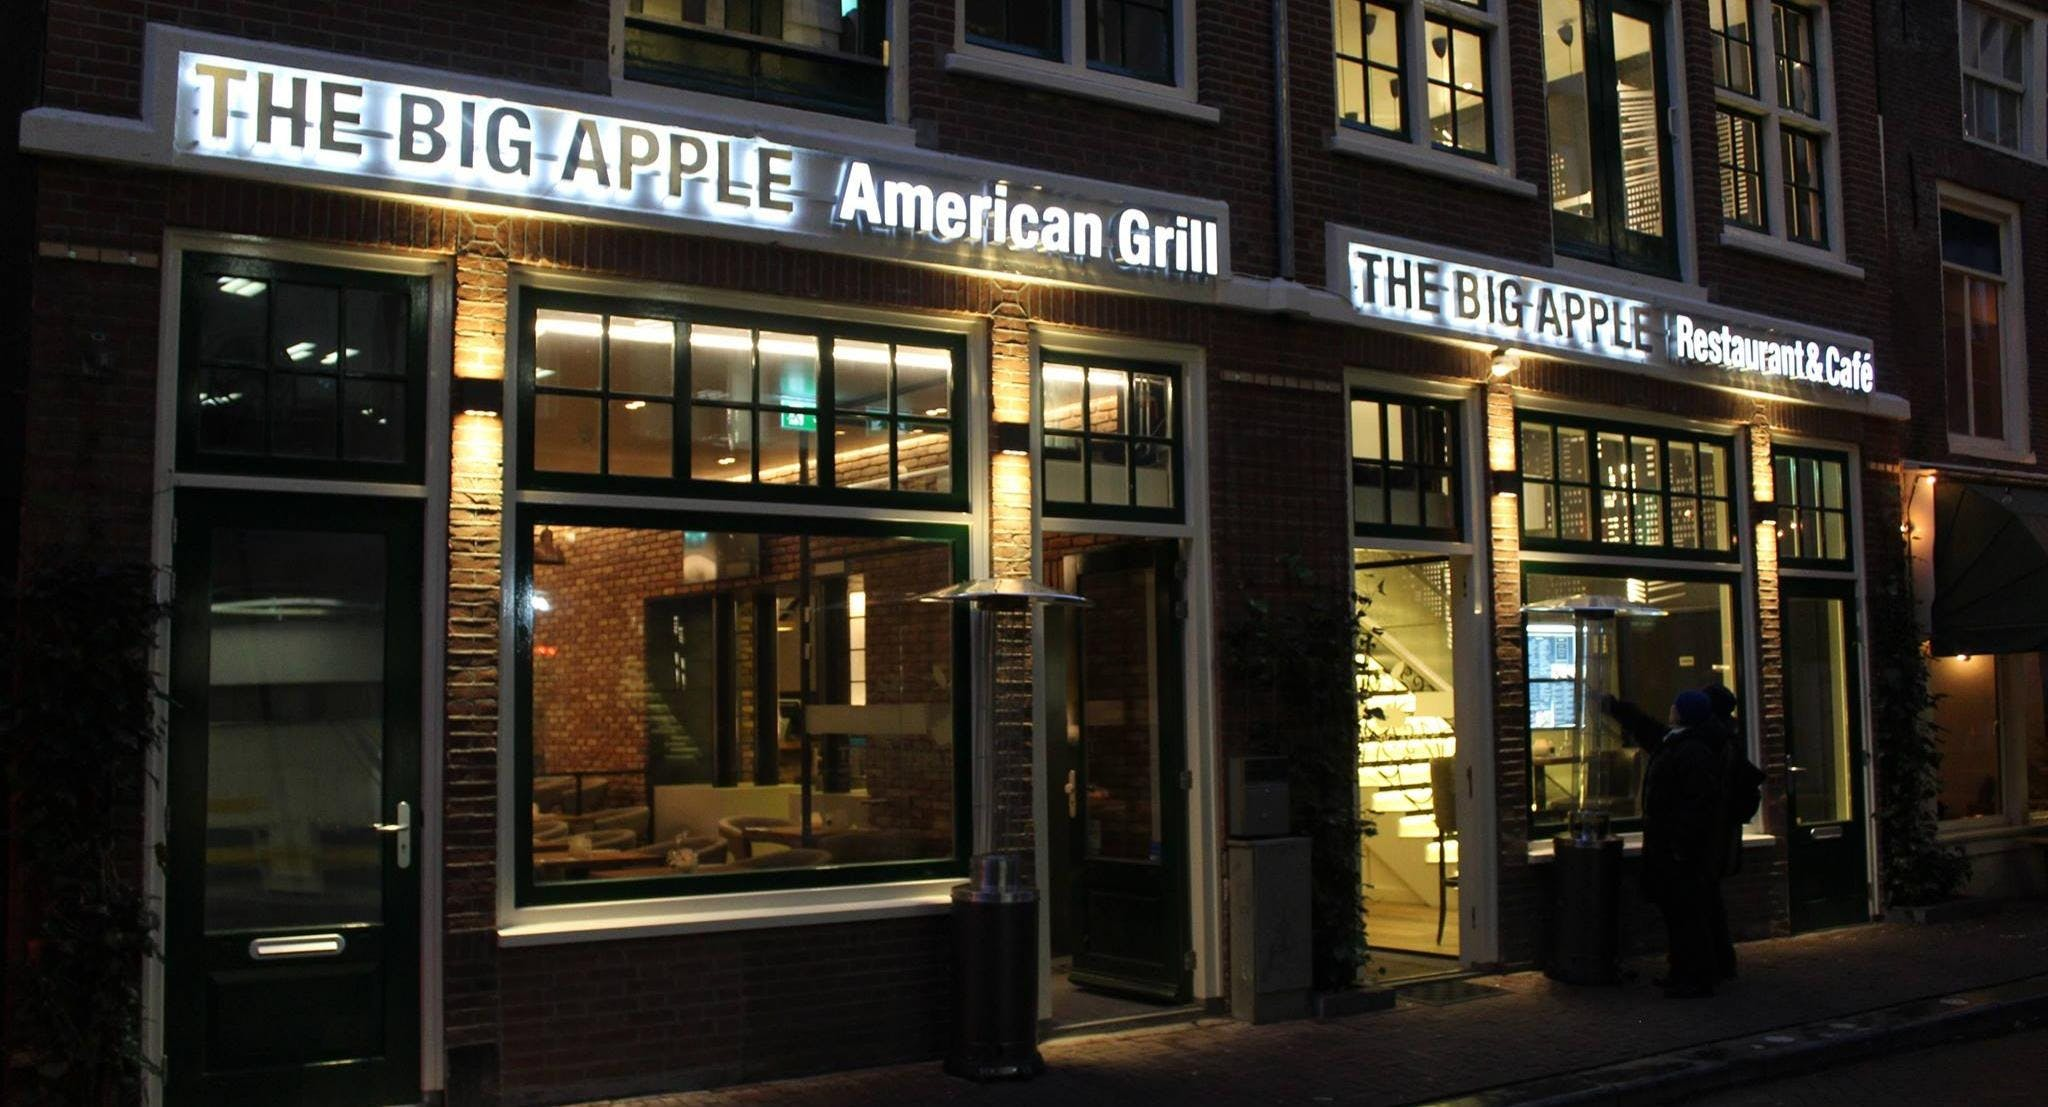 The Big Apple Amsterdam image 1